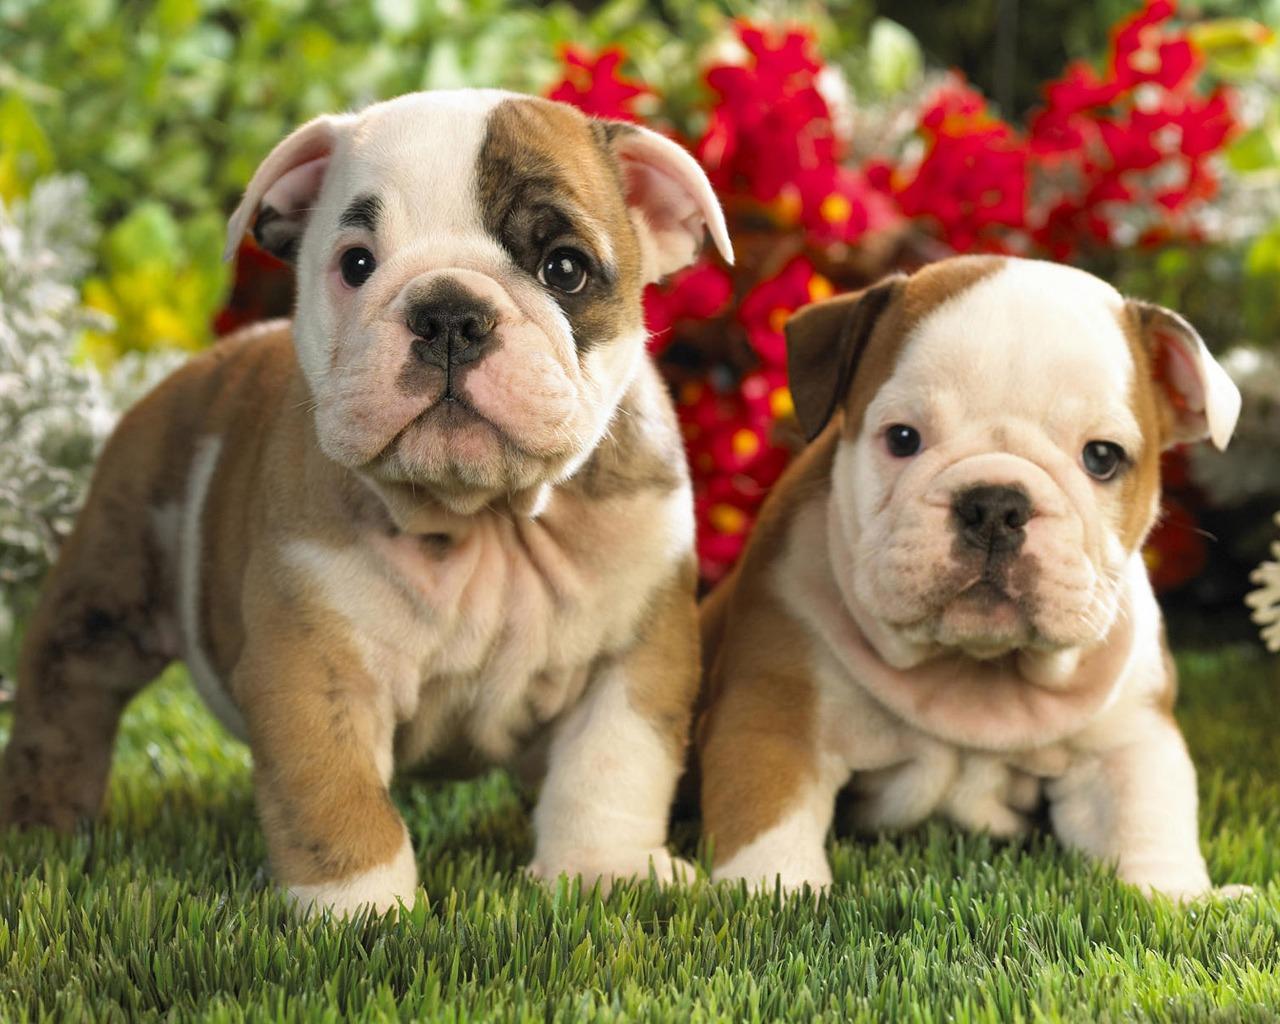 http://2.bp.blogspot.com/-RZTQYMq1M8U/T5P5uDFsgVI/AAAAAAAAh5c/XA5dJUCk4_A/s1600/wallpapers-perros-bulldogs-cachorros.jpg